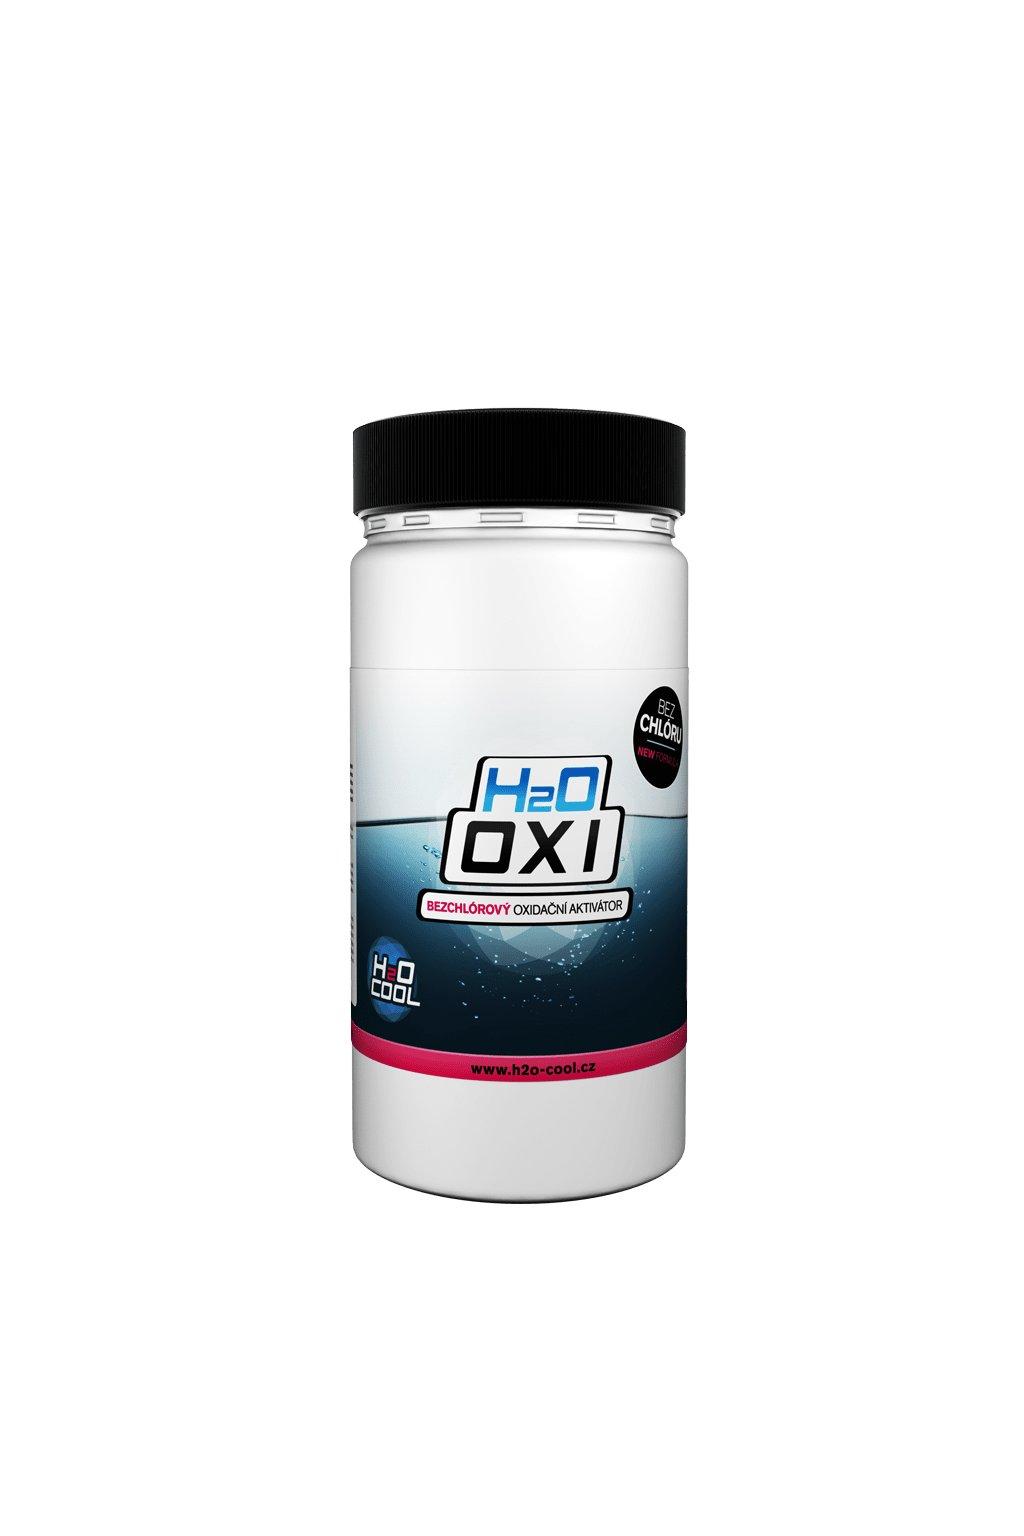 12 bezchlorova oxidace bazenove vody h2o oxi